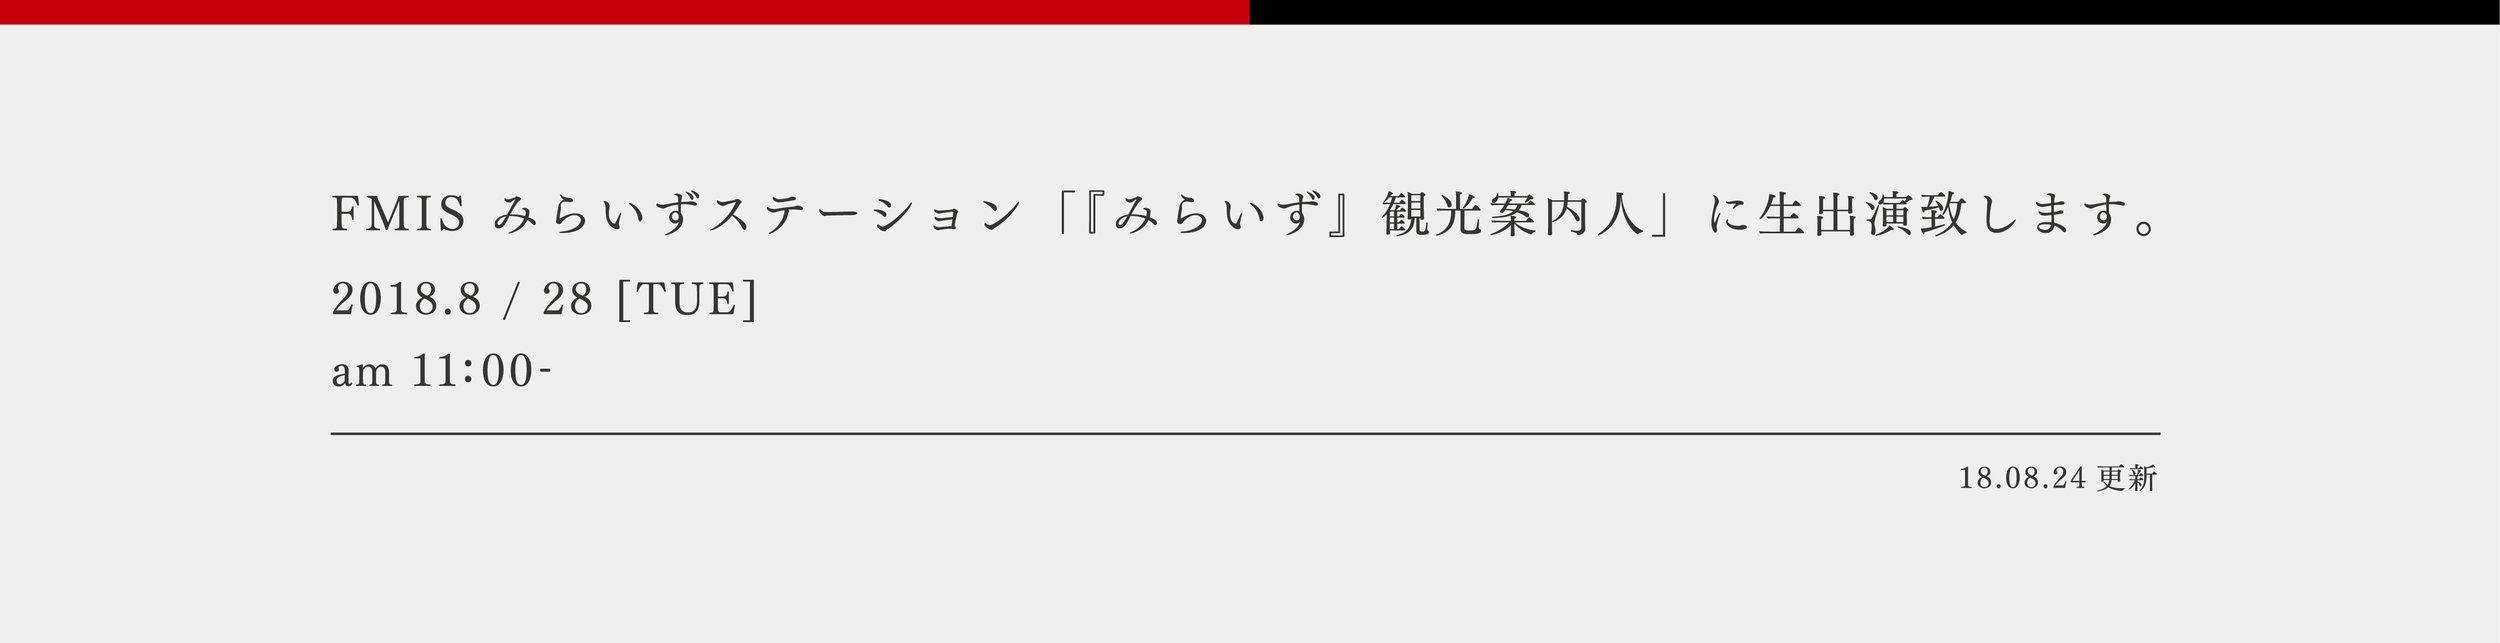 M_web-19.jpg